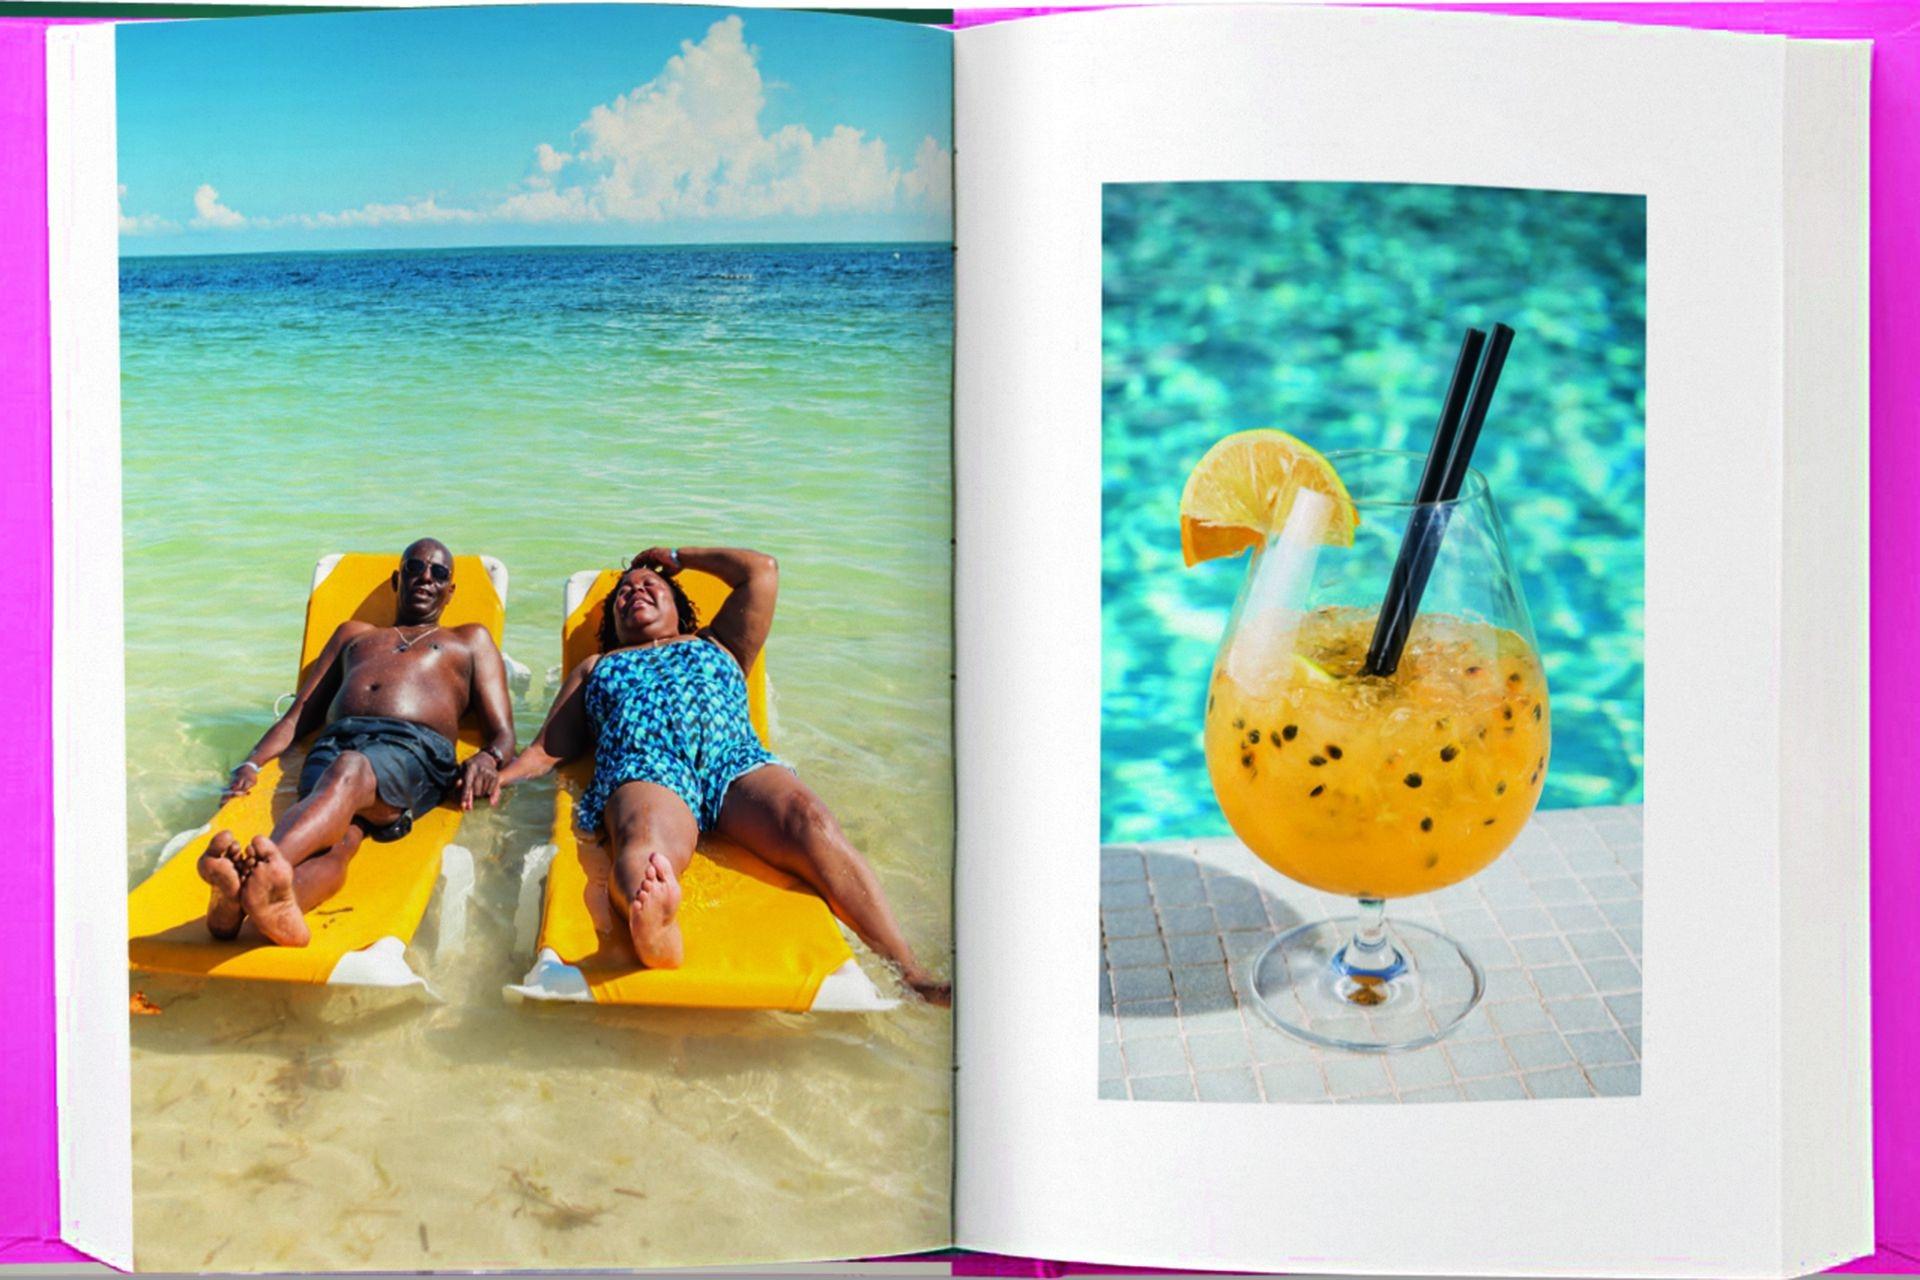 Puro relax en Montego Bay, Jamaica. Caipiroska de maracuyá en una pileta de Buenos Aires.